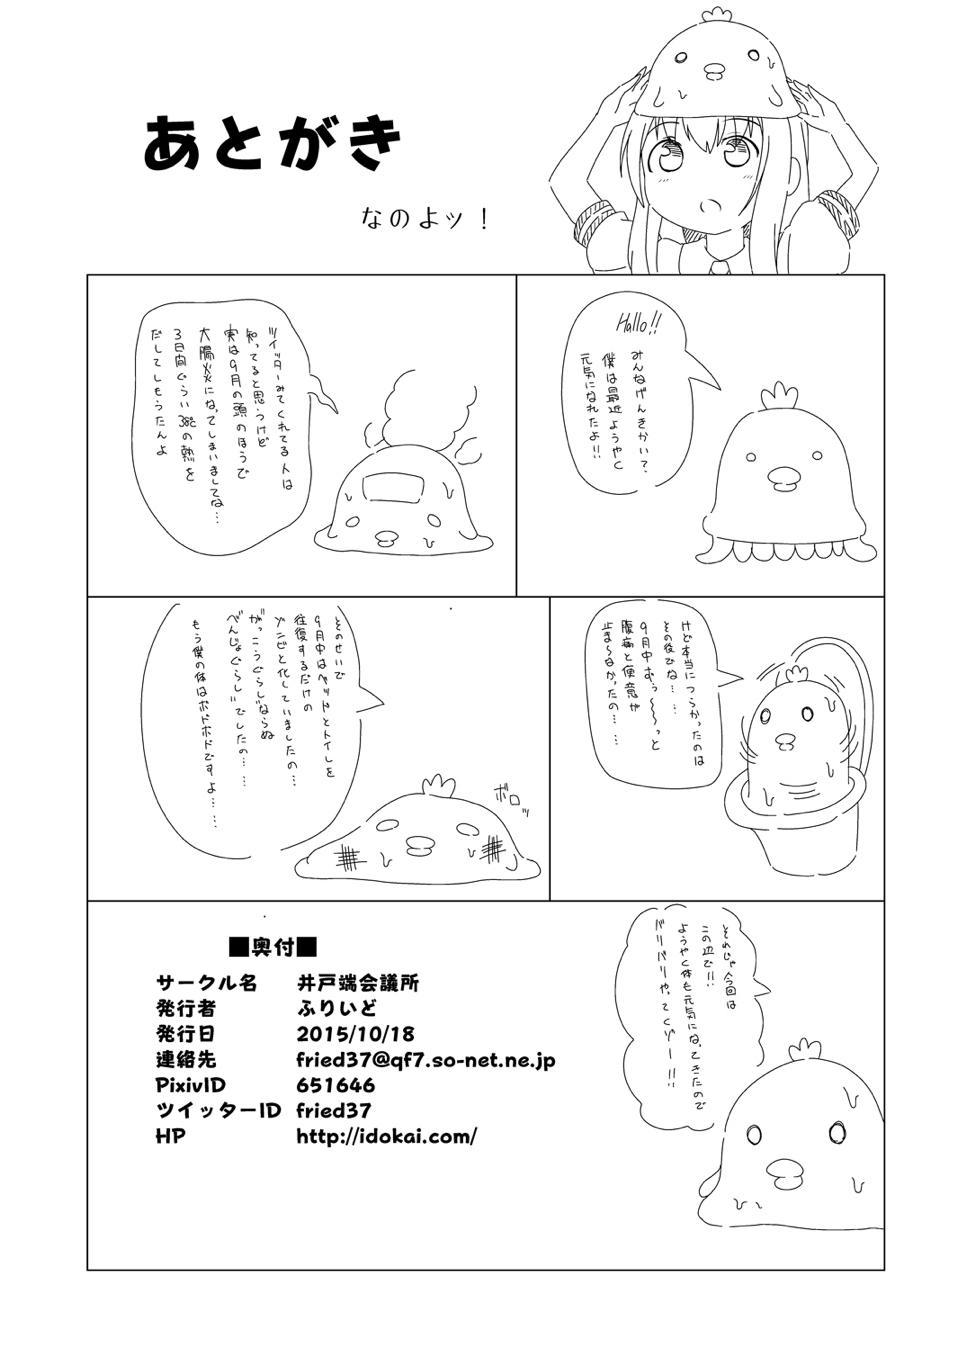 Tenshi Ijime 20